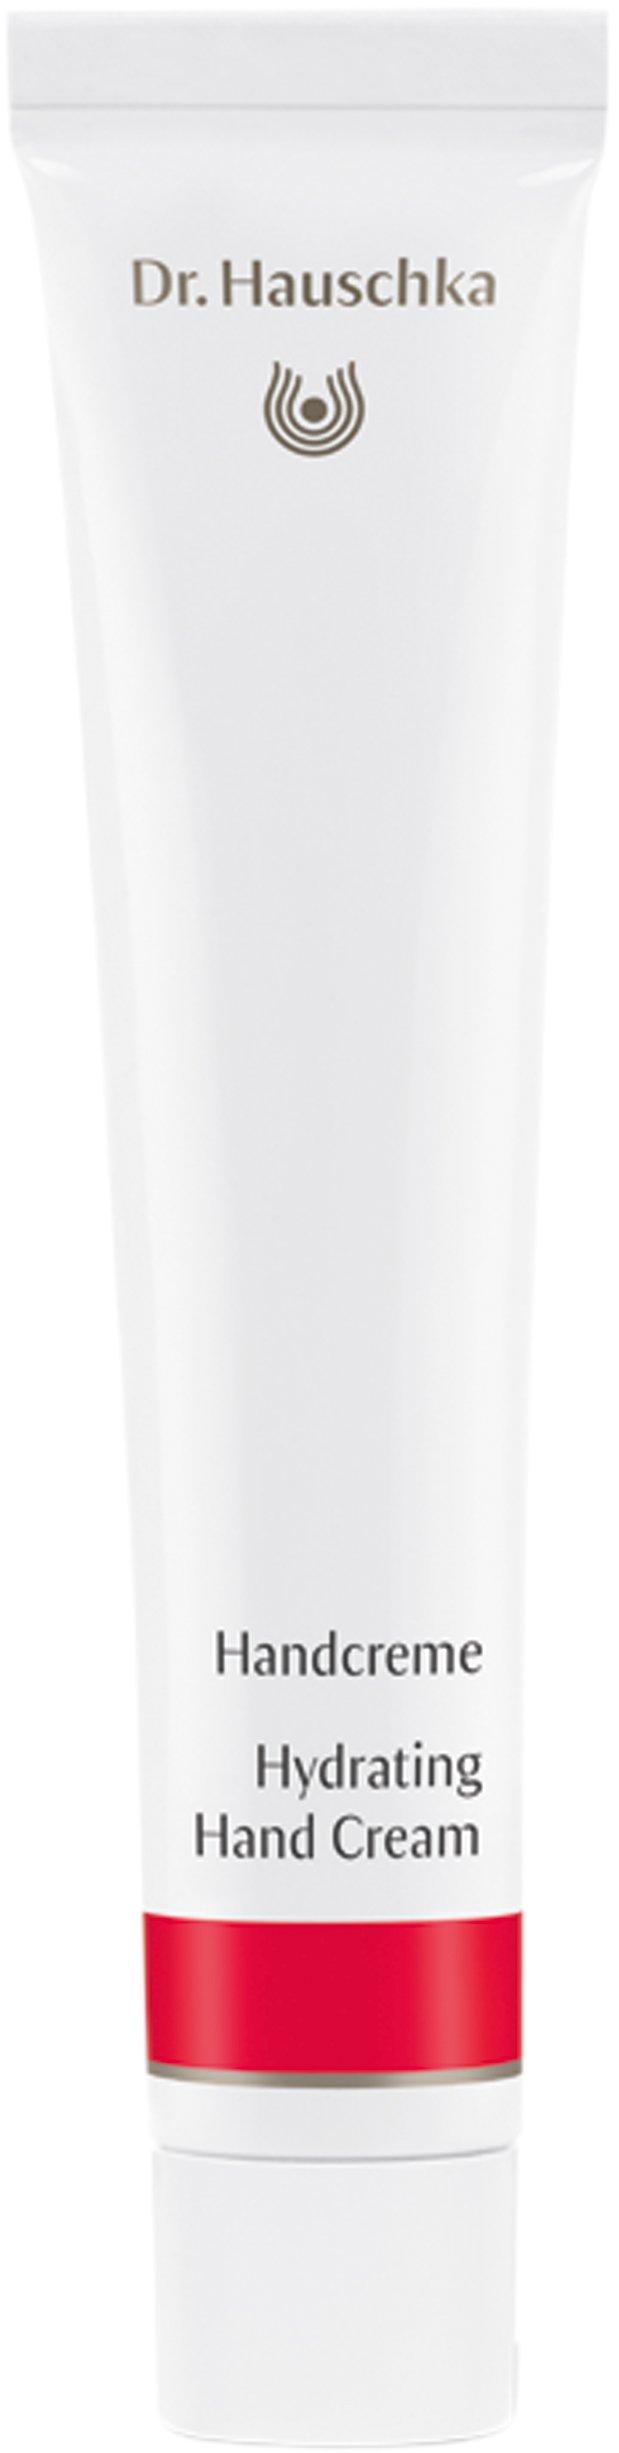 Dr. Hauschka - Hydrating Håndcreme 50 ml